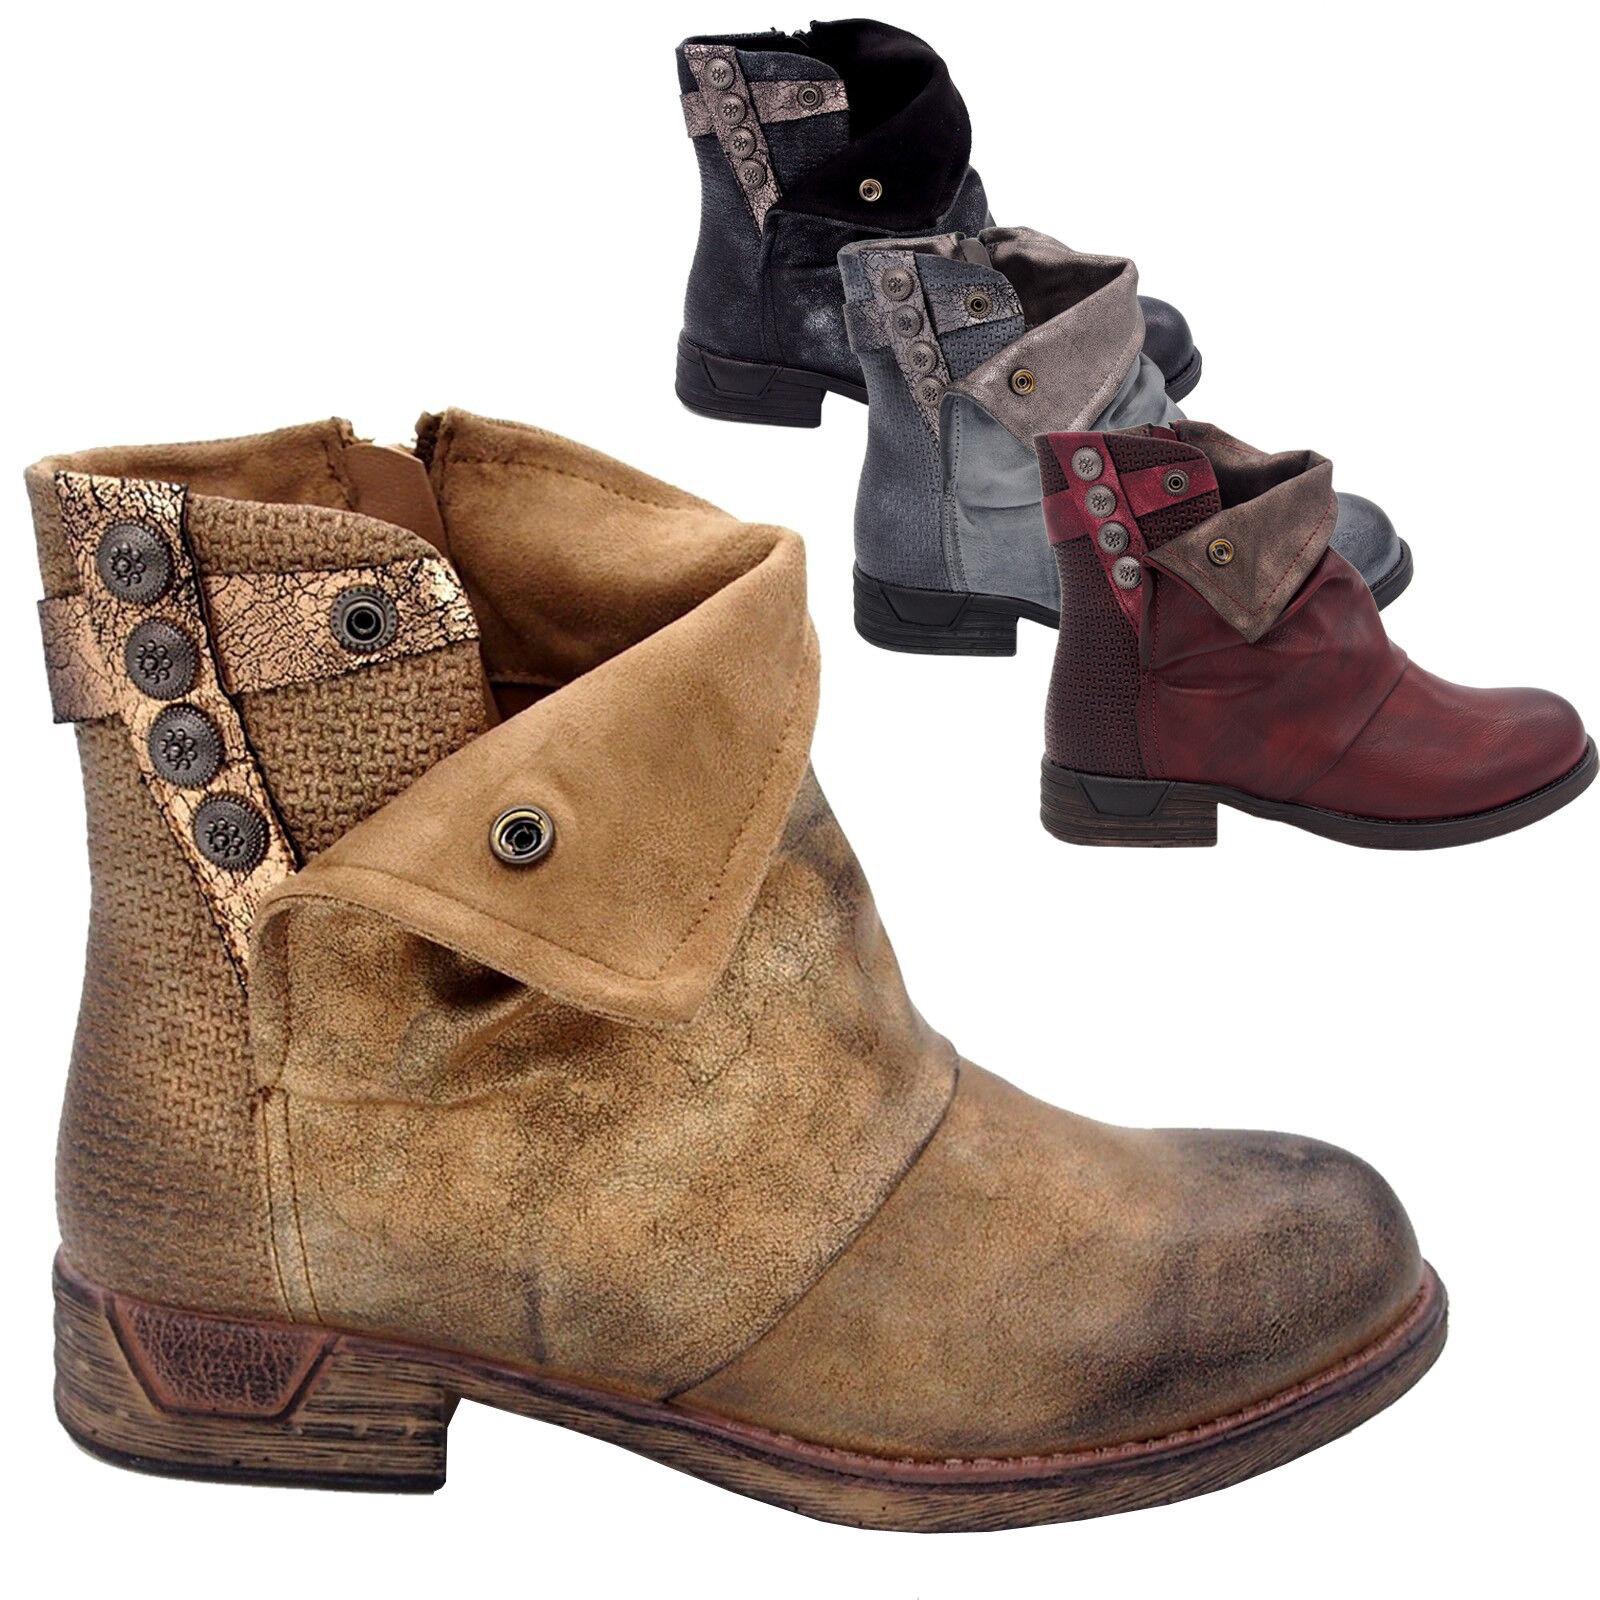 8809117995b3 Chaussures Bottines boots vintage femme Bout rond Talon plat cuir ...